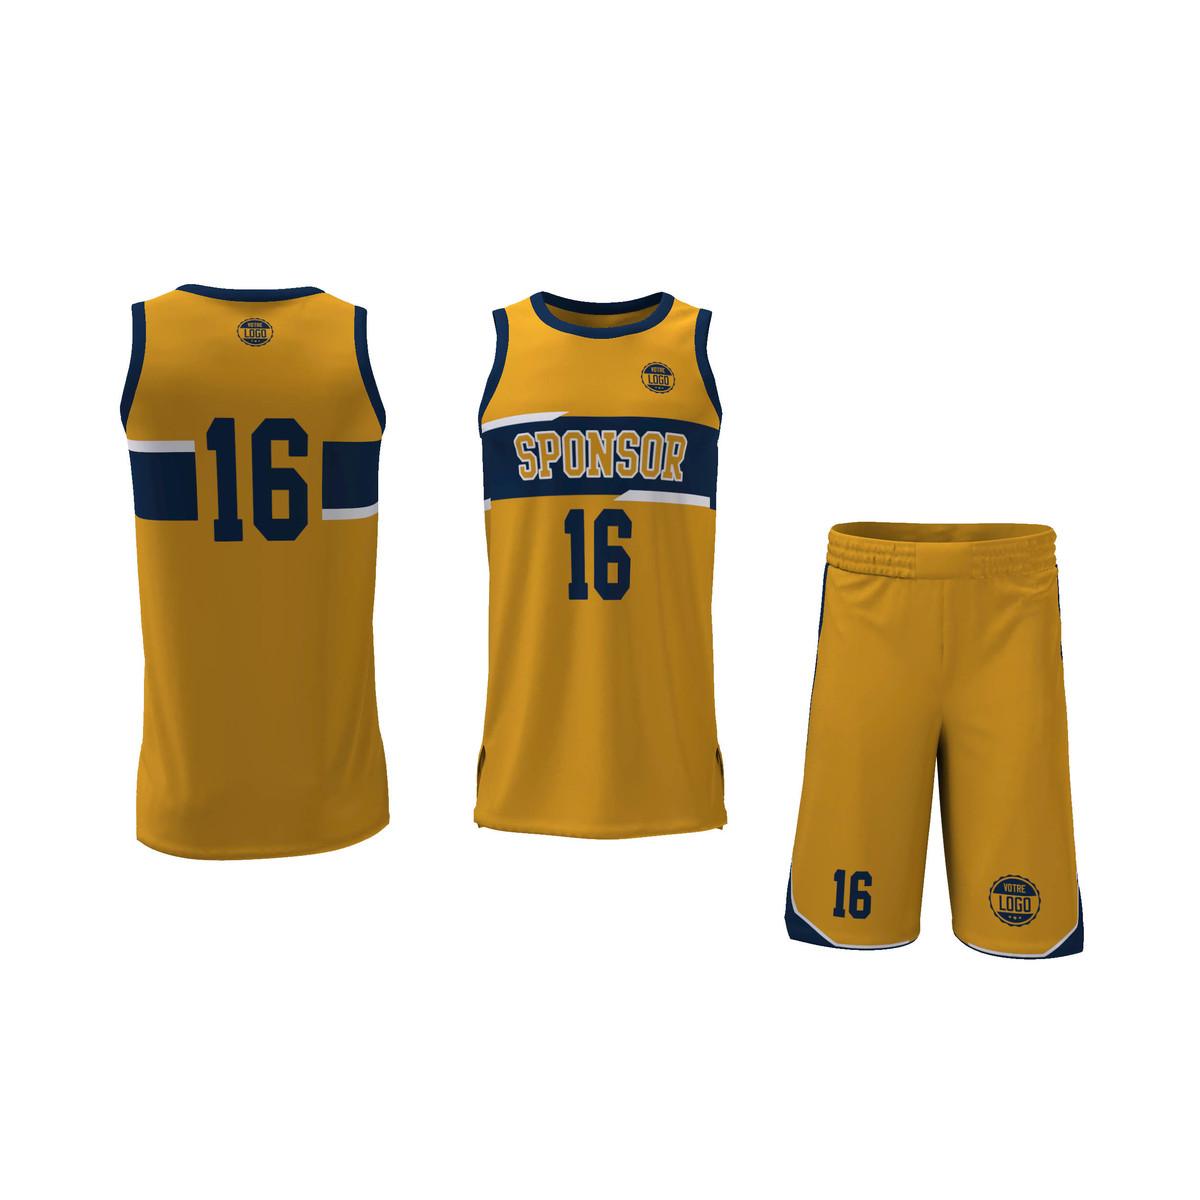 Image_basketball-18-set1-v2--0-0--f14b43f4-450b-48e0-b767-b69a5675d263